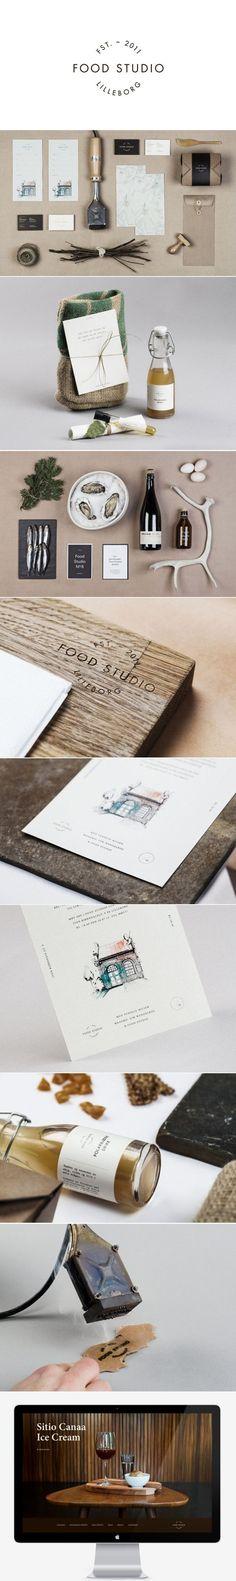 Unique Branding Design, Food Studio #Branding #Design (http://www.pinterest.com/aldenchong/)